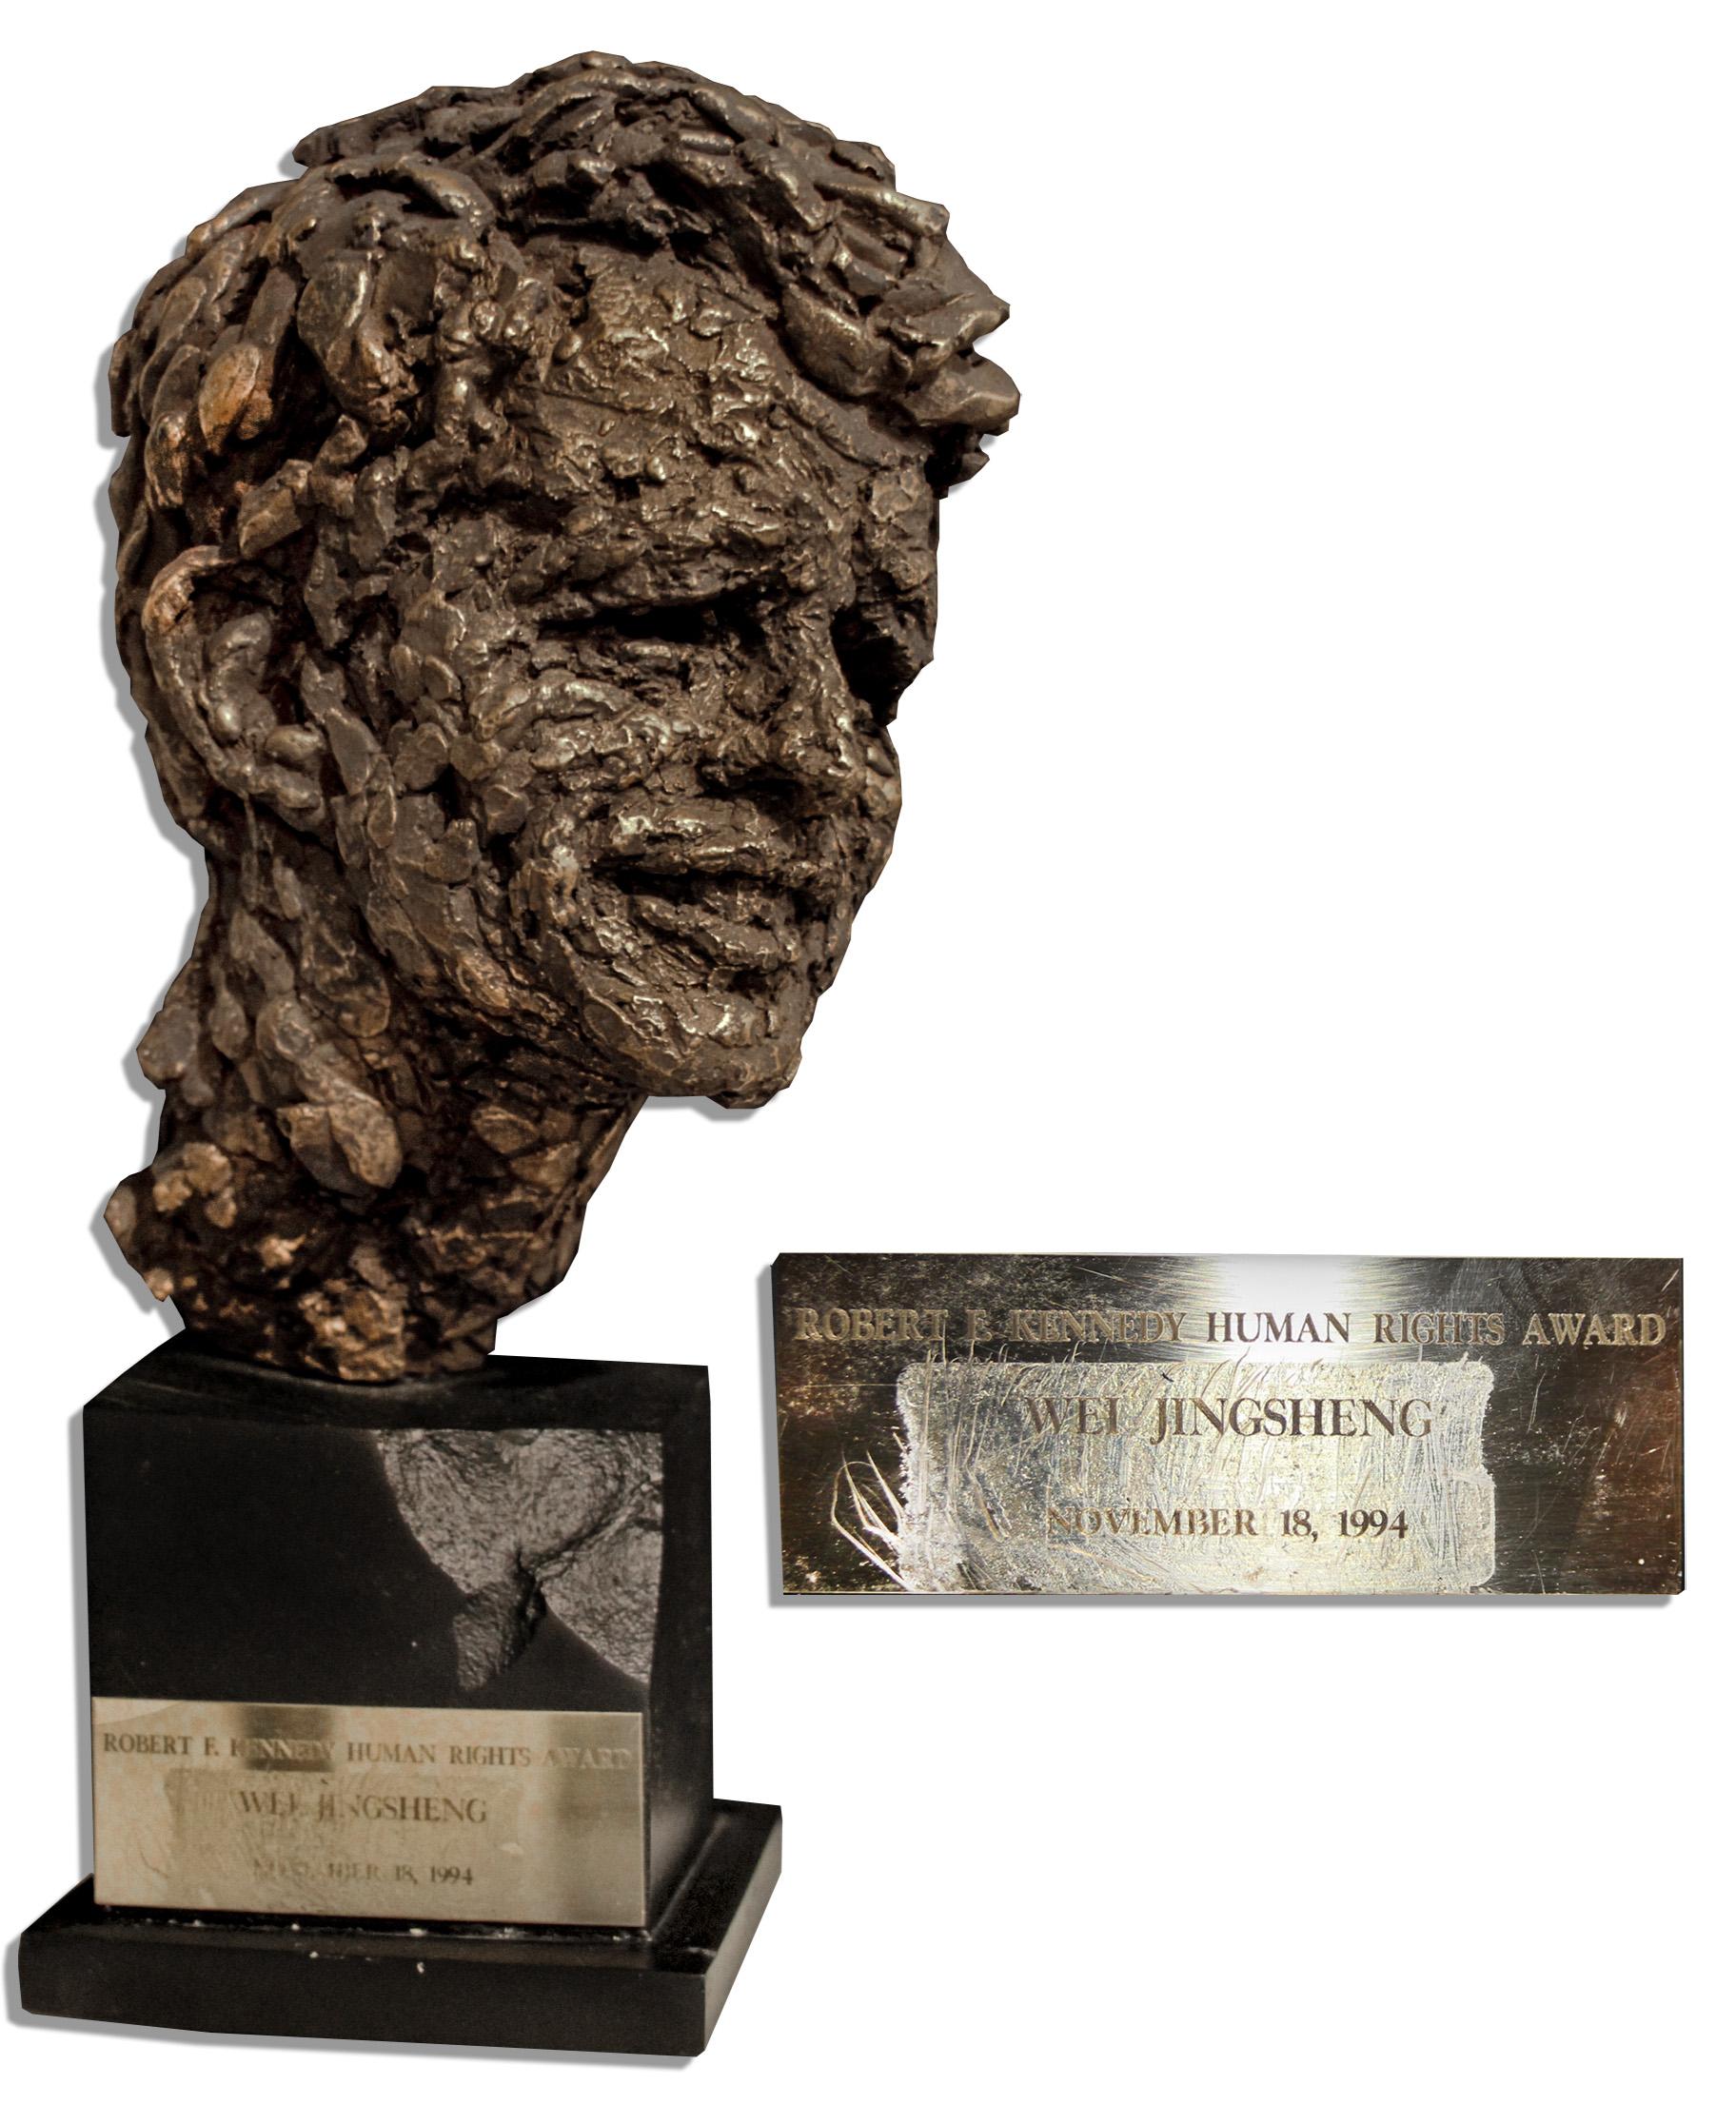 Robert F. Kennedy Human Rights Award